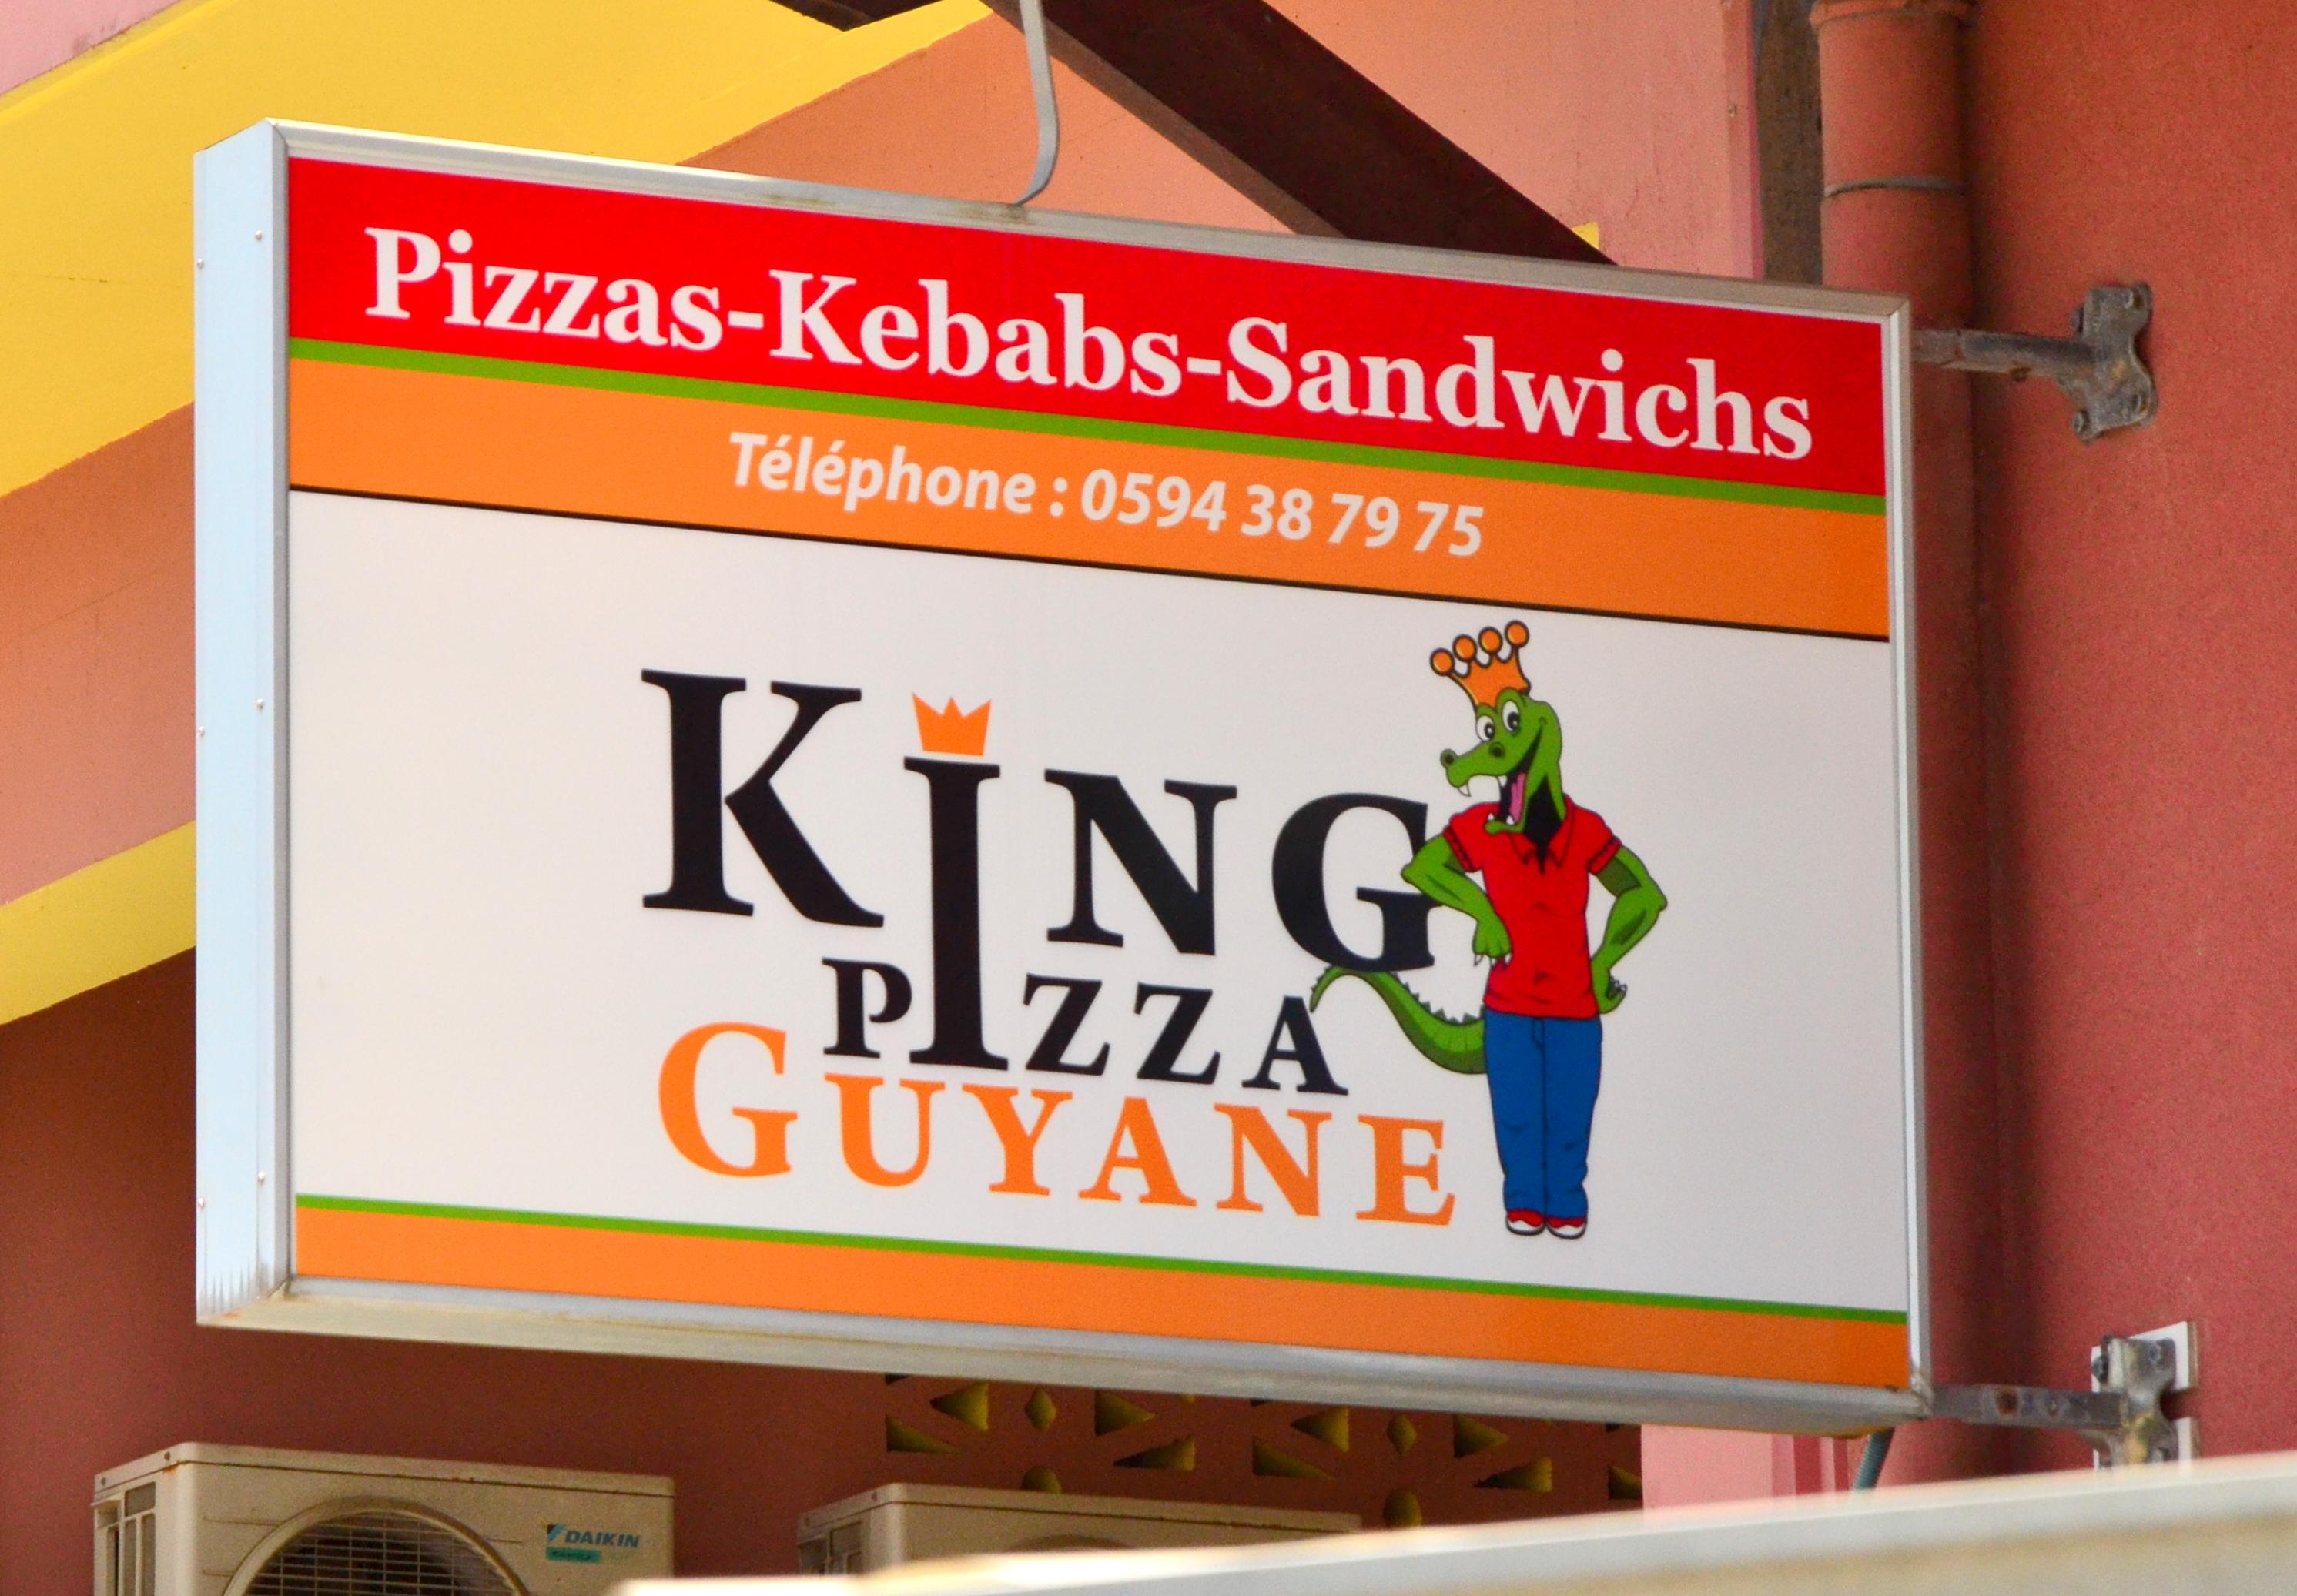 King pizza guyane